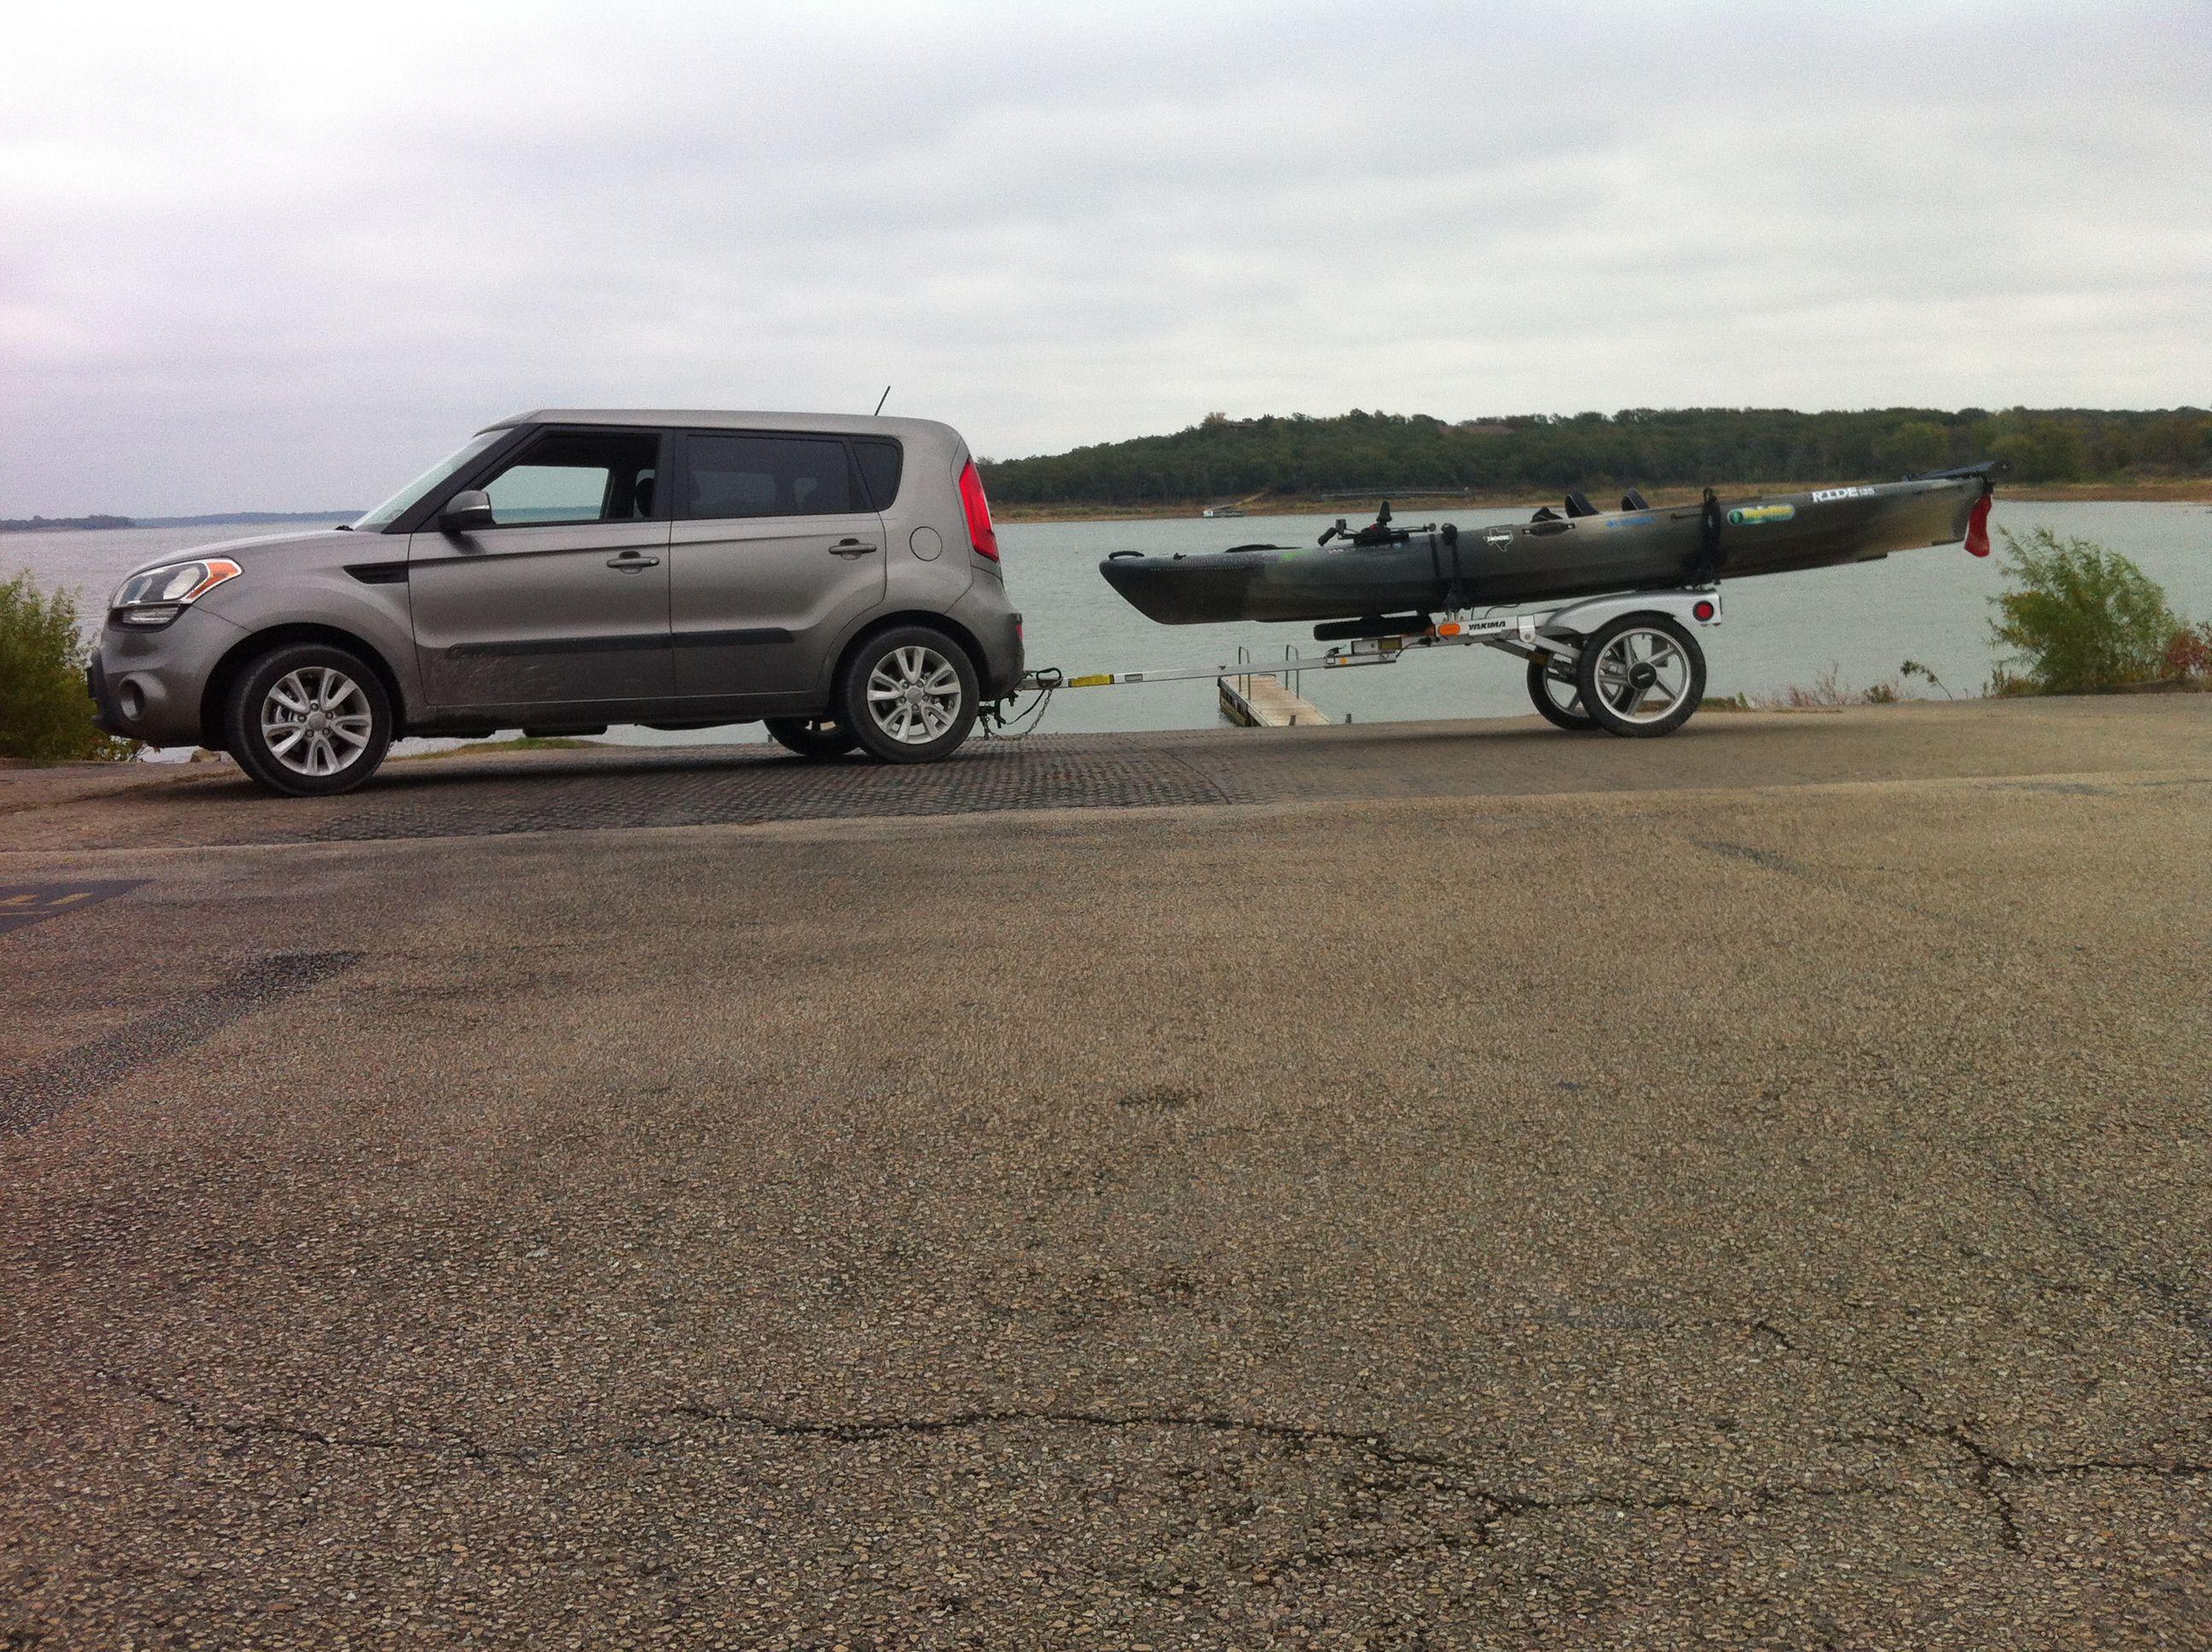 Great 2013 Kia Soul With A Yakima Rack N Roll Trailer. U003d 30+ MPG Pulling Two  Kayaks!